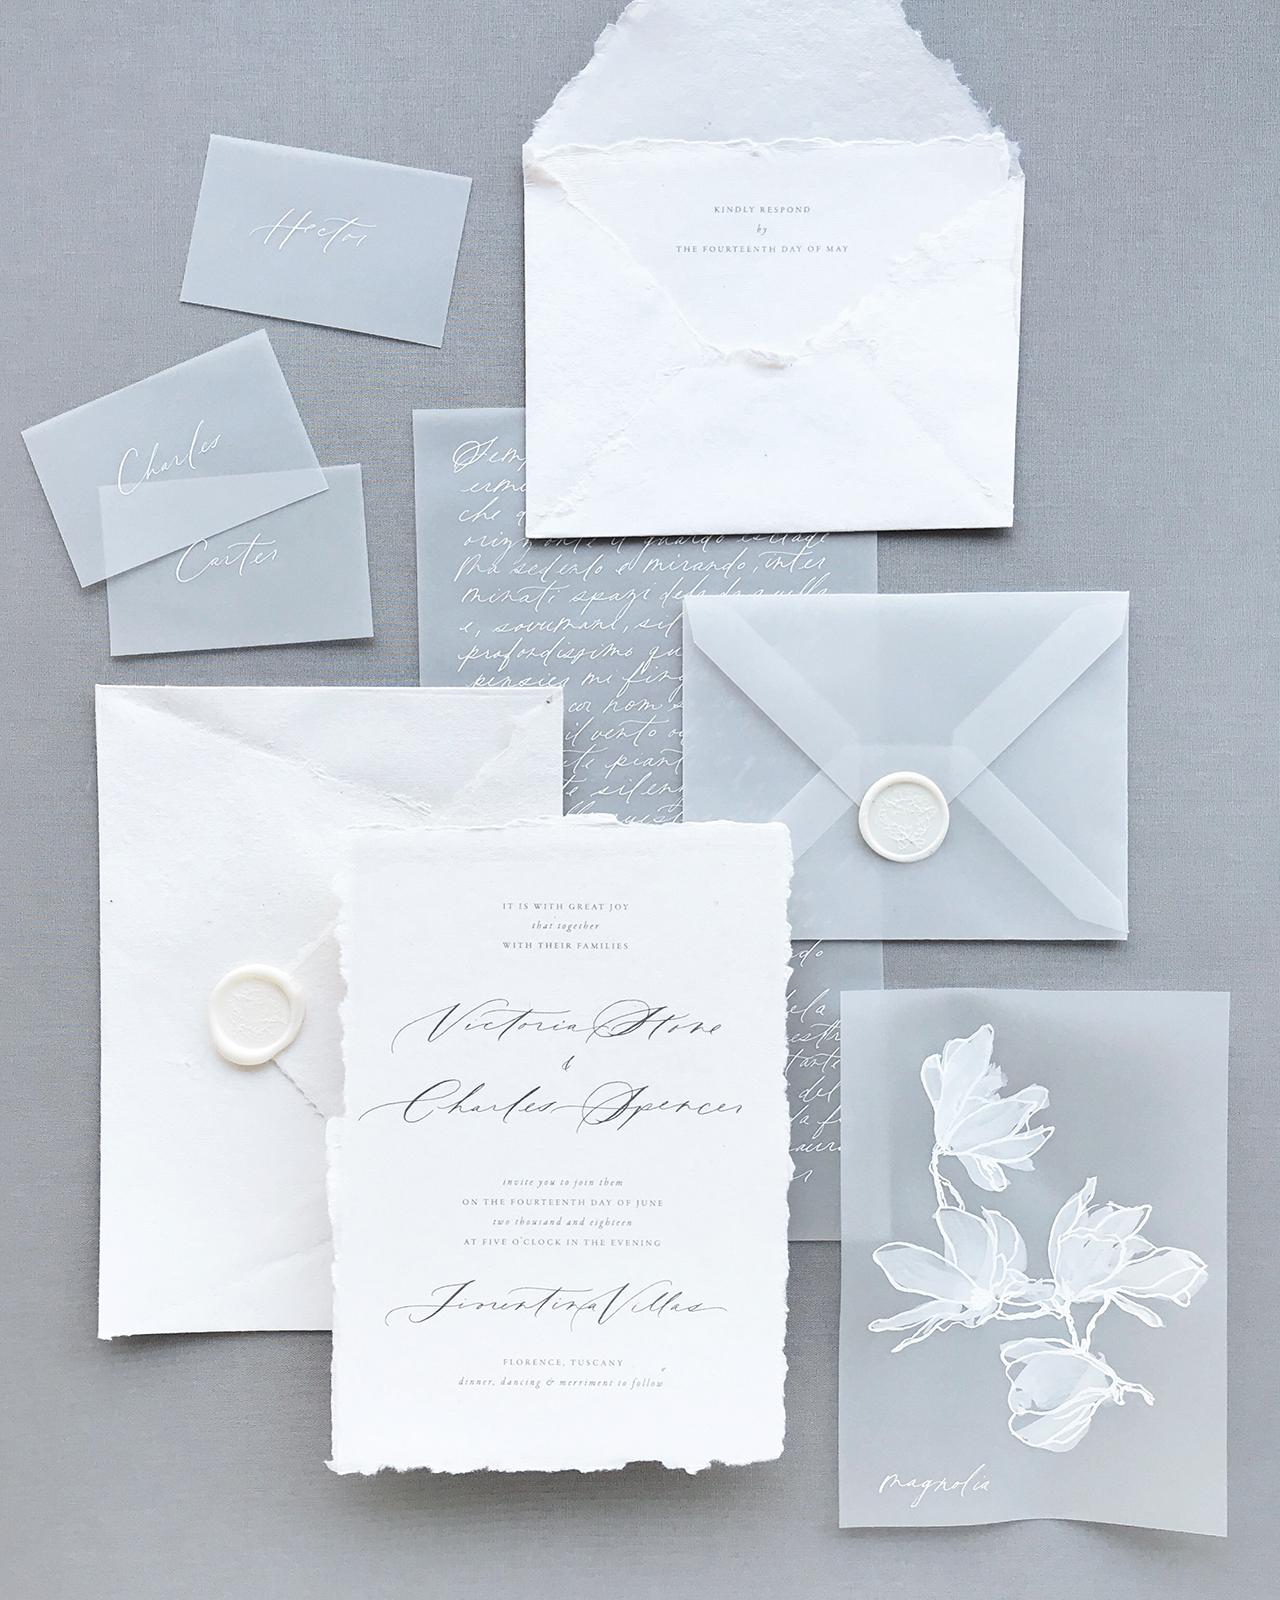 vellum snow white winter wedding invitation